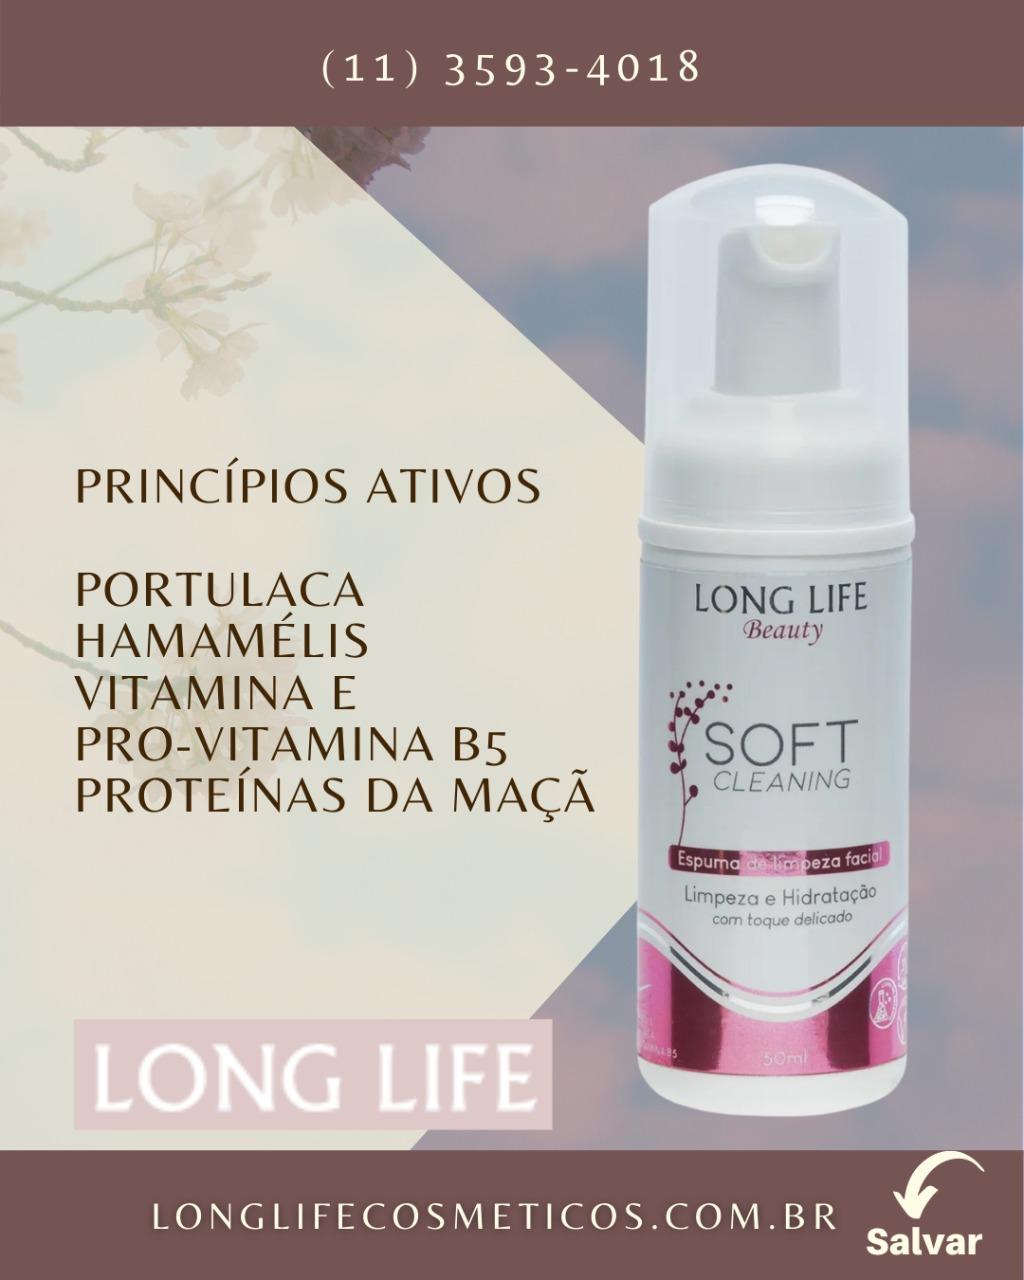 Sabonete Mousse Soft Cleaning 50 ml - Skin Care (3 unds) - Espuma Facial